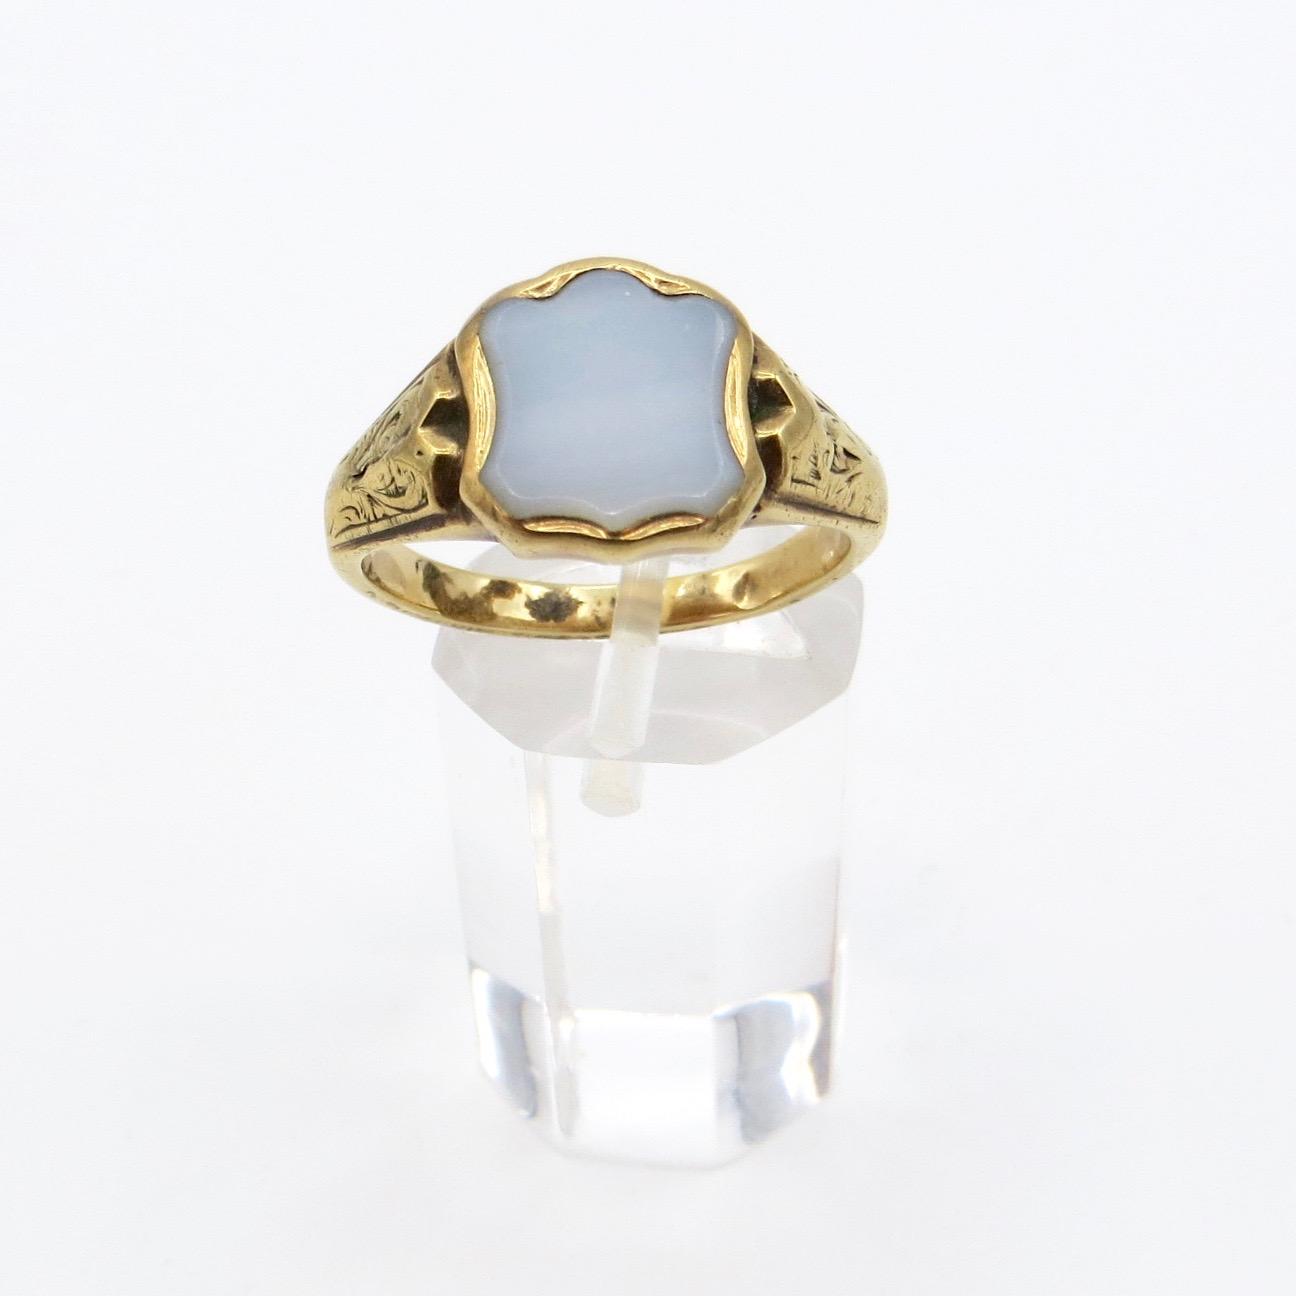 Victorian 14kt Gold & Sardonyx Ring